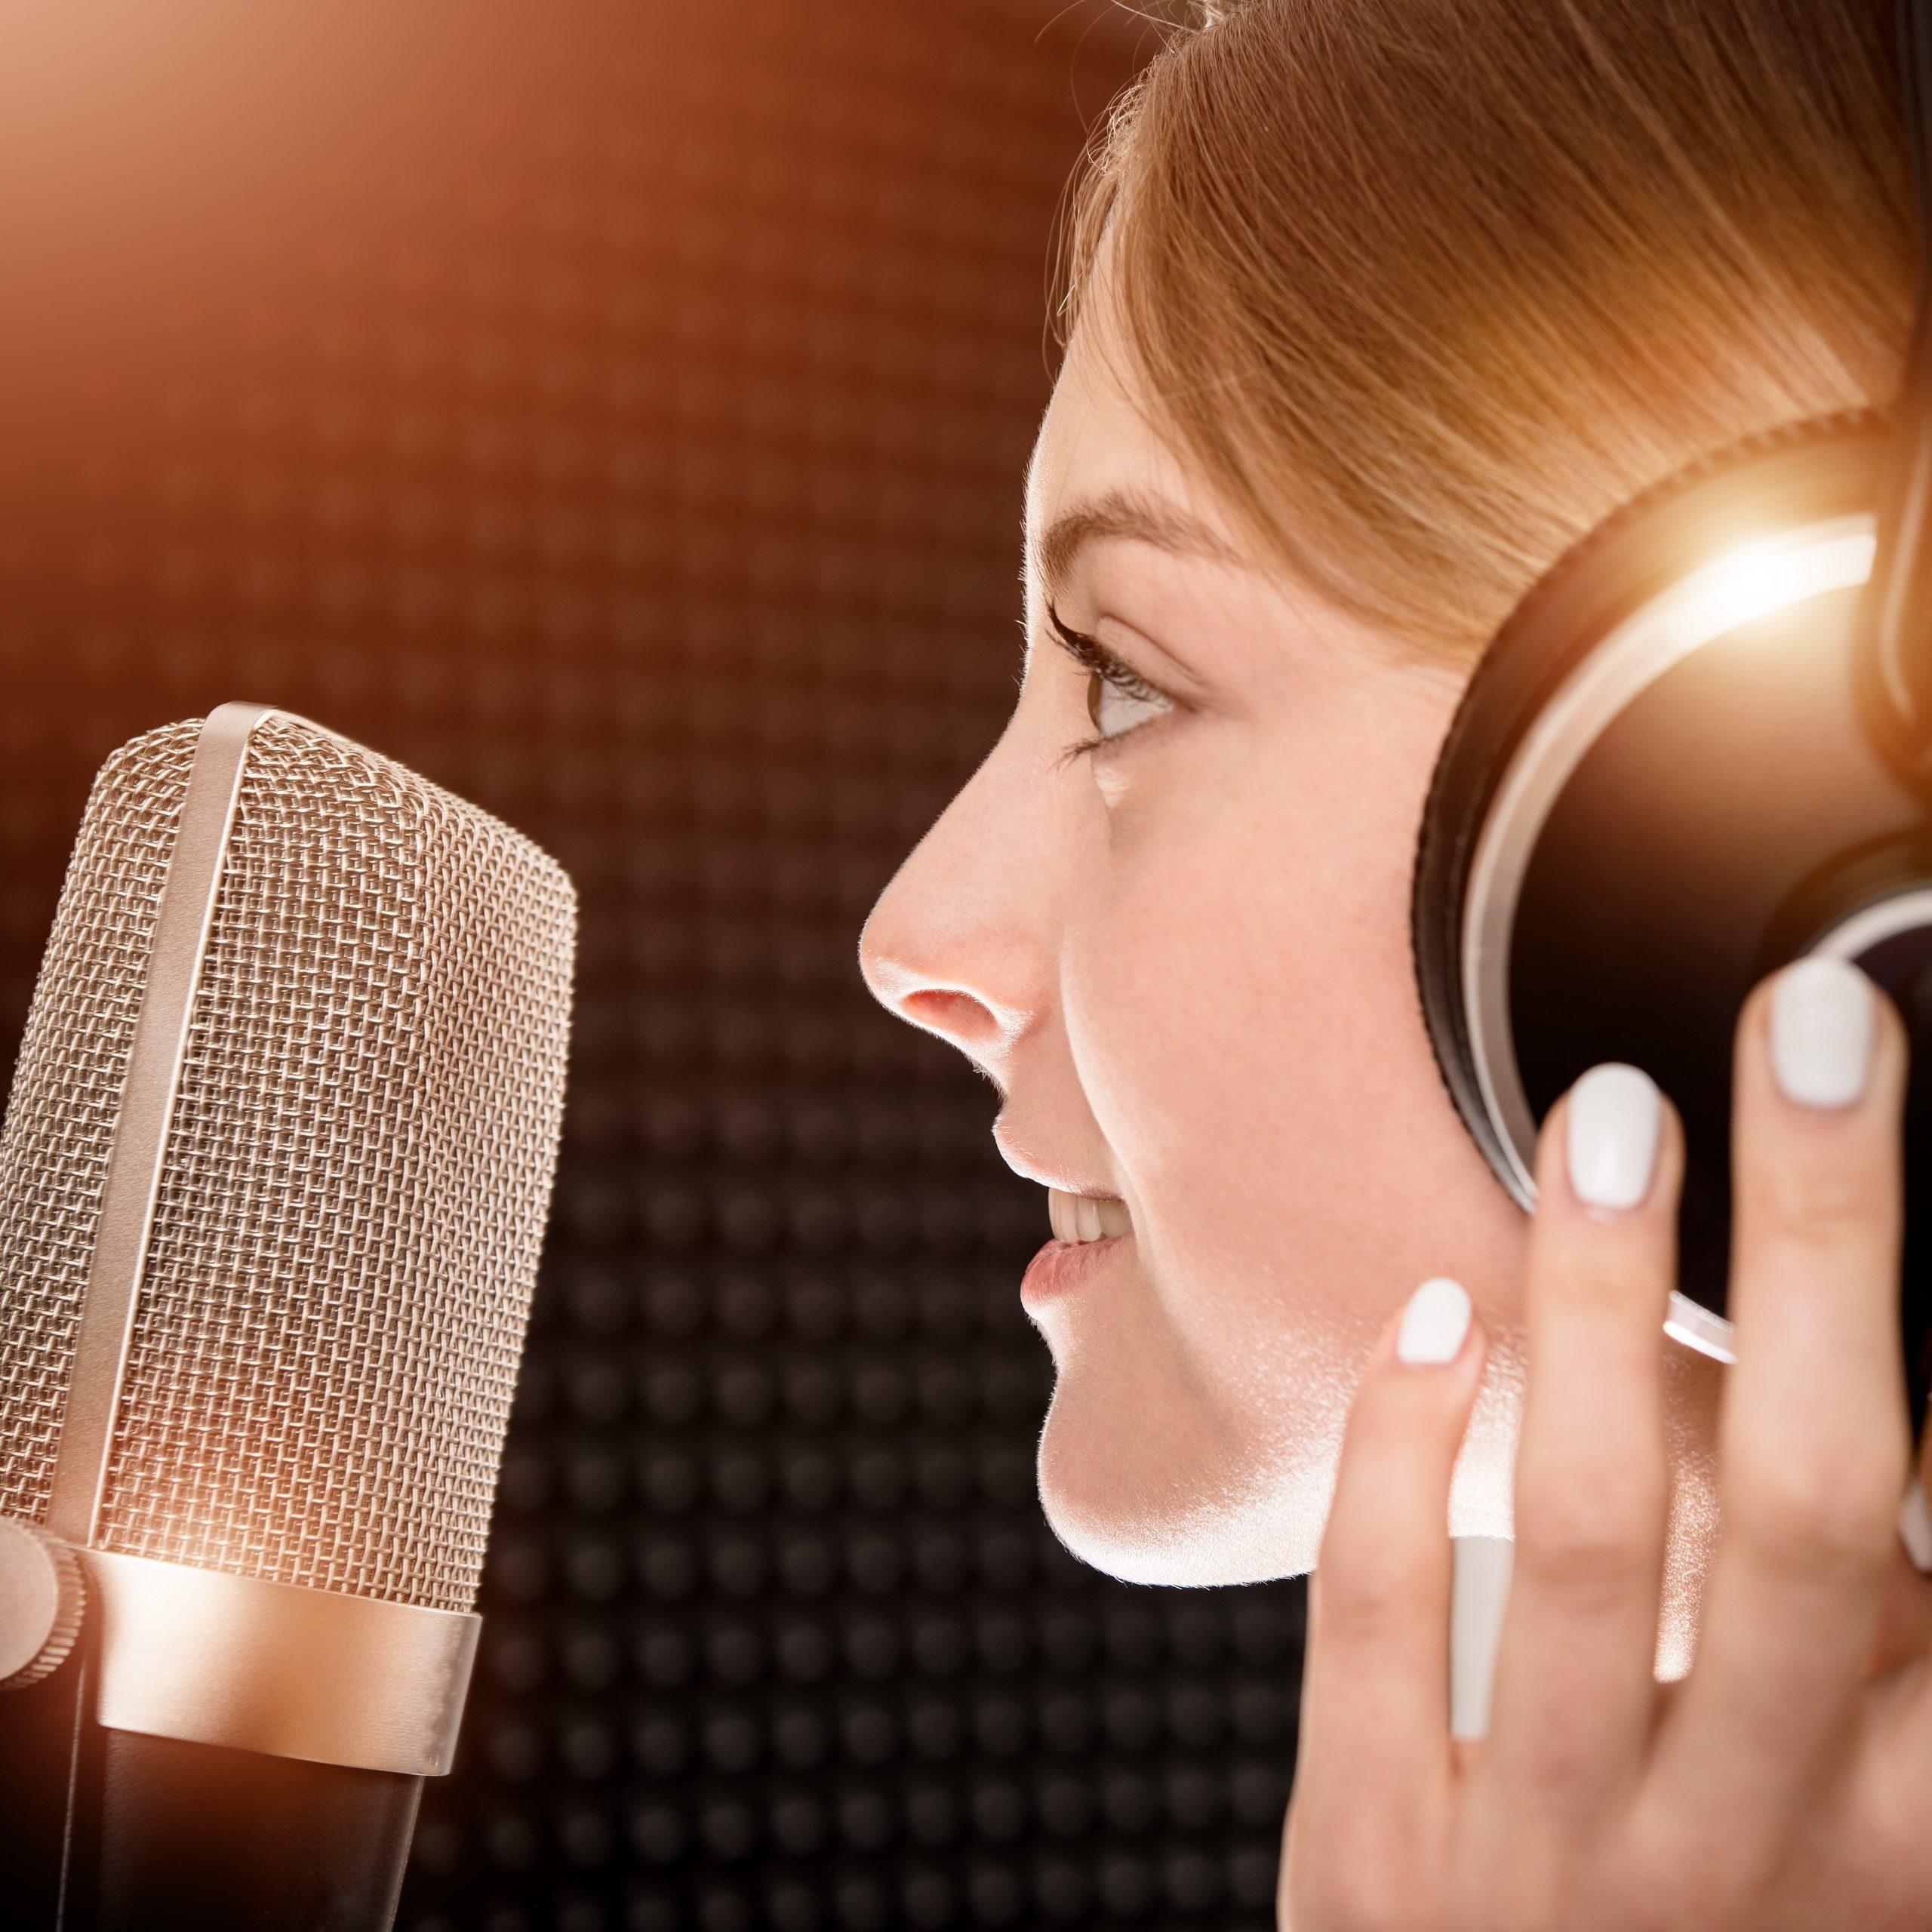 Female Voice Talent